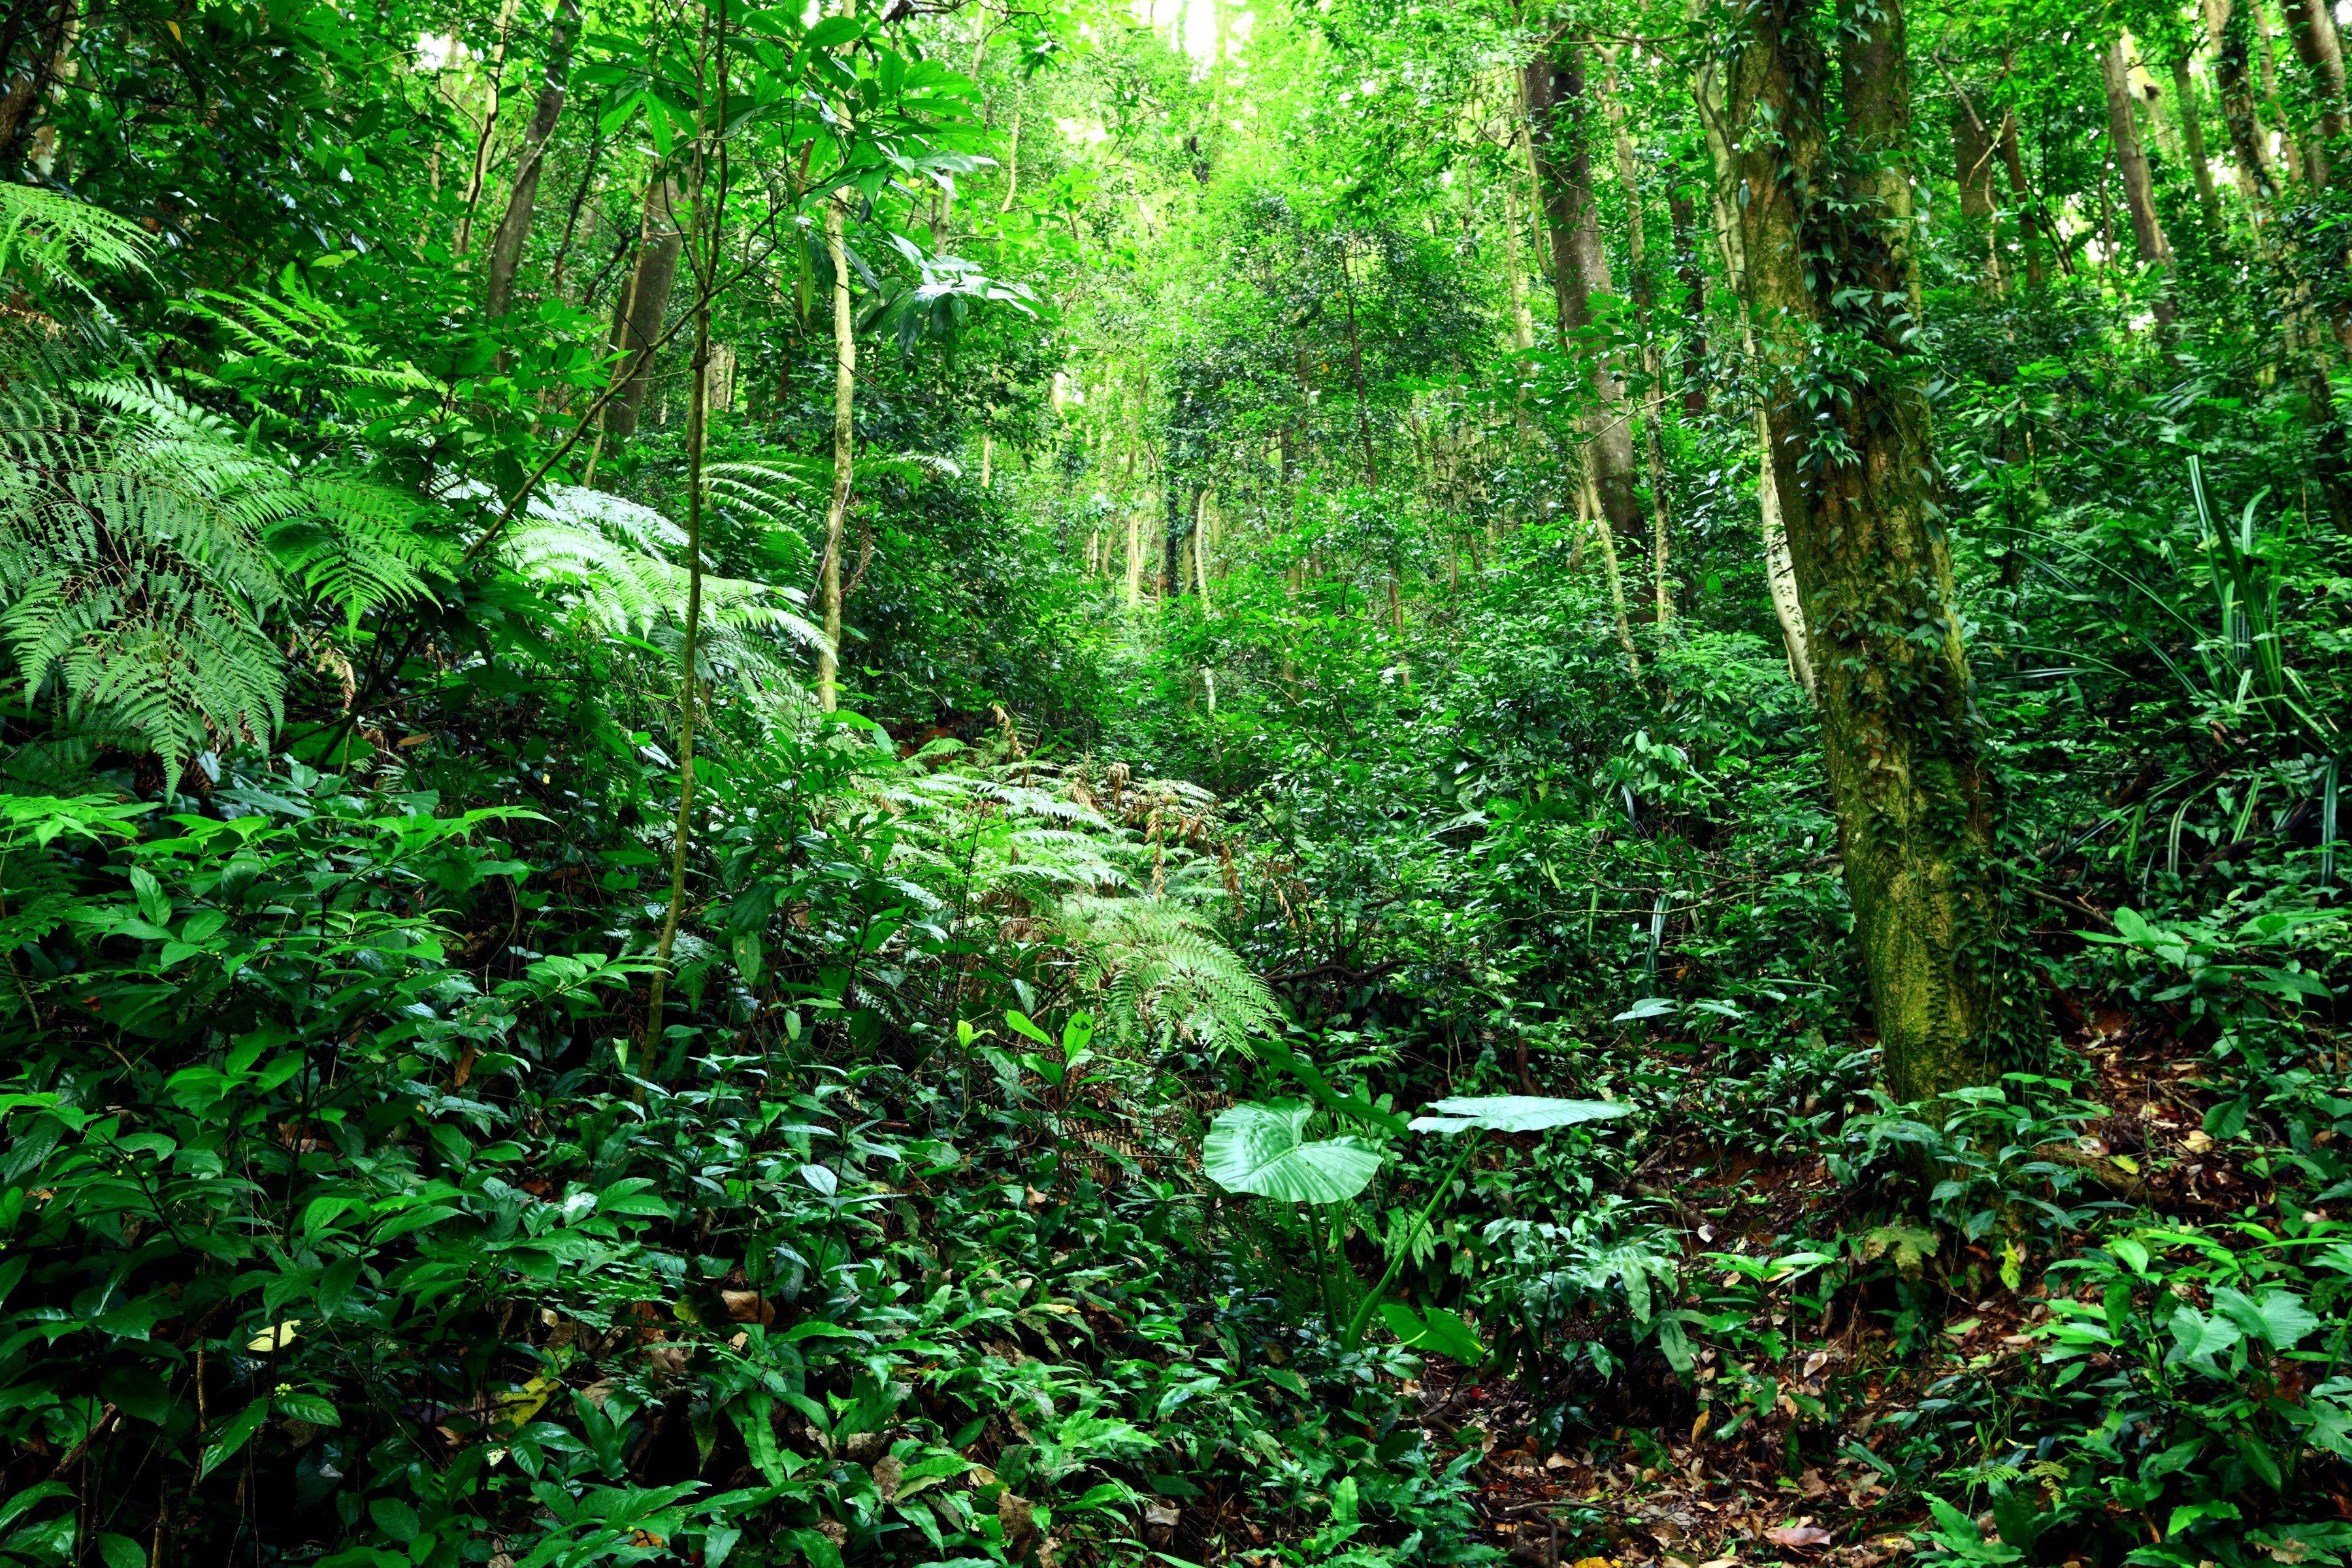 landscape, Plants, Forest, Trees Wallpaper